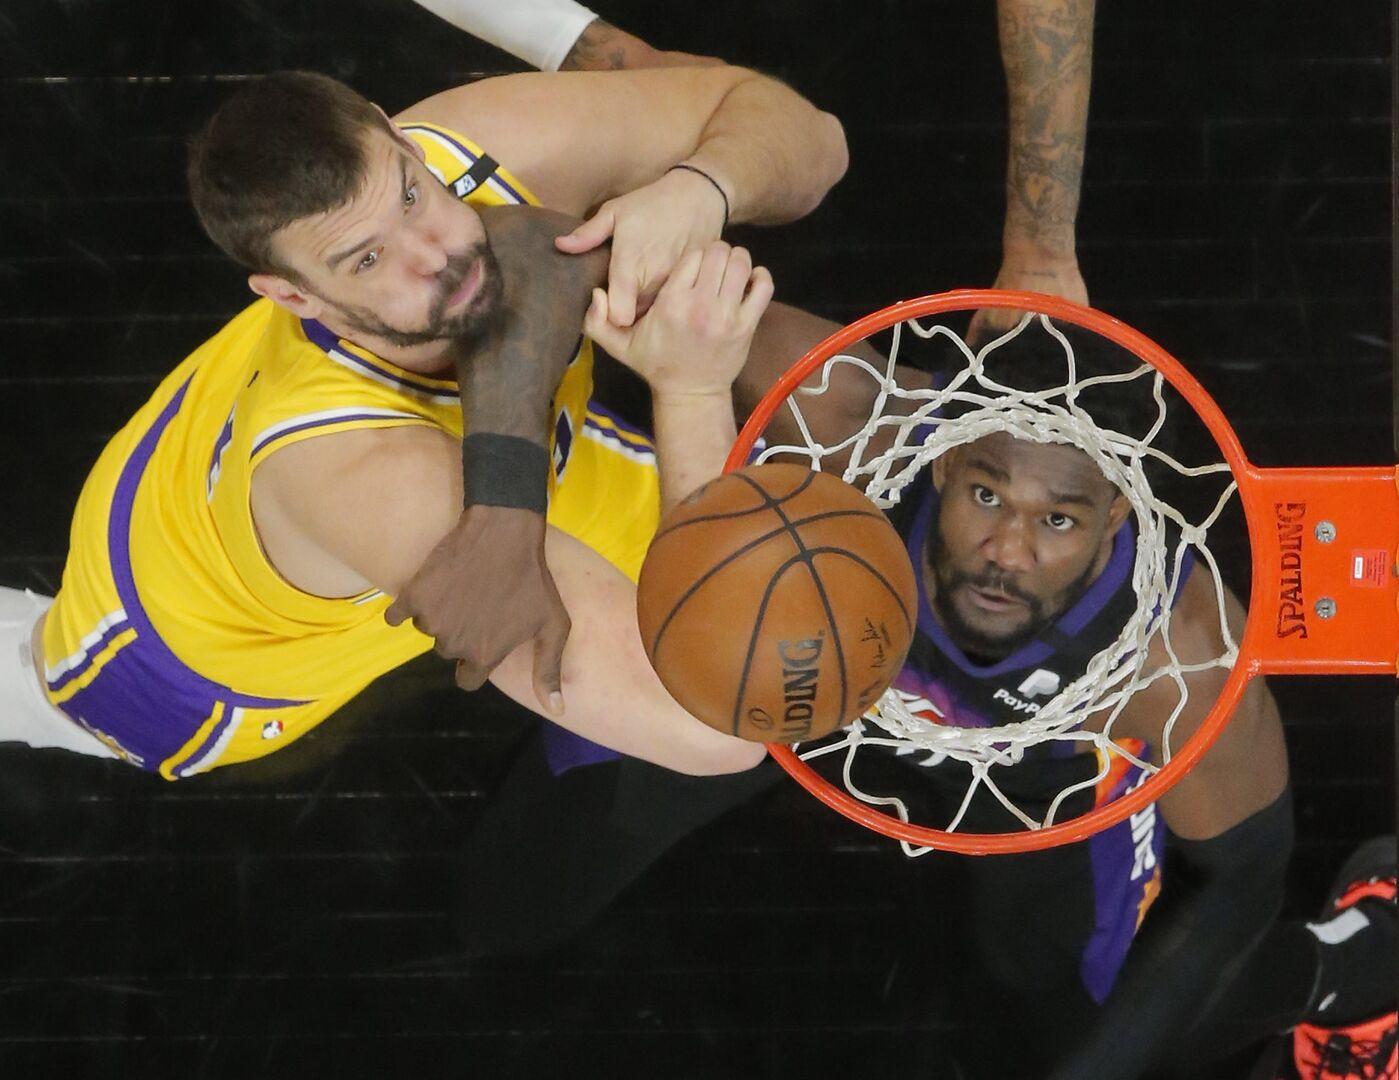 Los Suns humillan a unos Lakers al borde del abismo (115-85) - Libertad  Digital